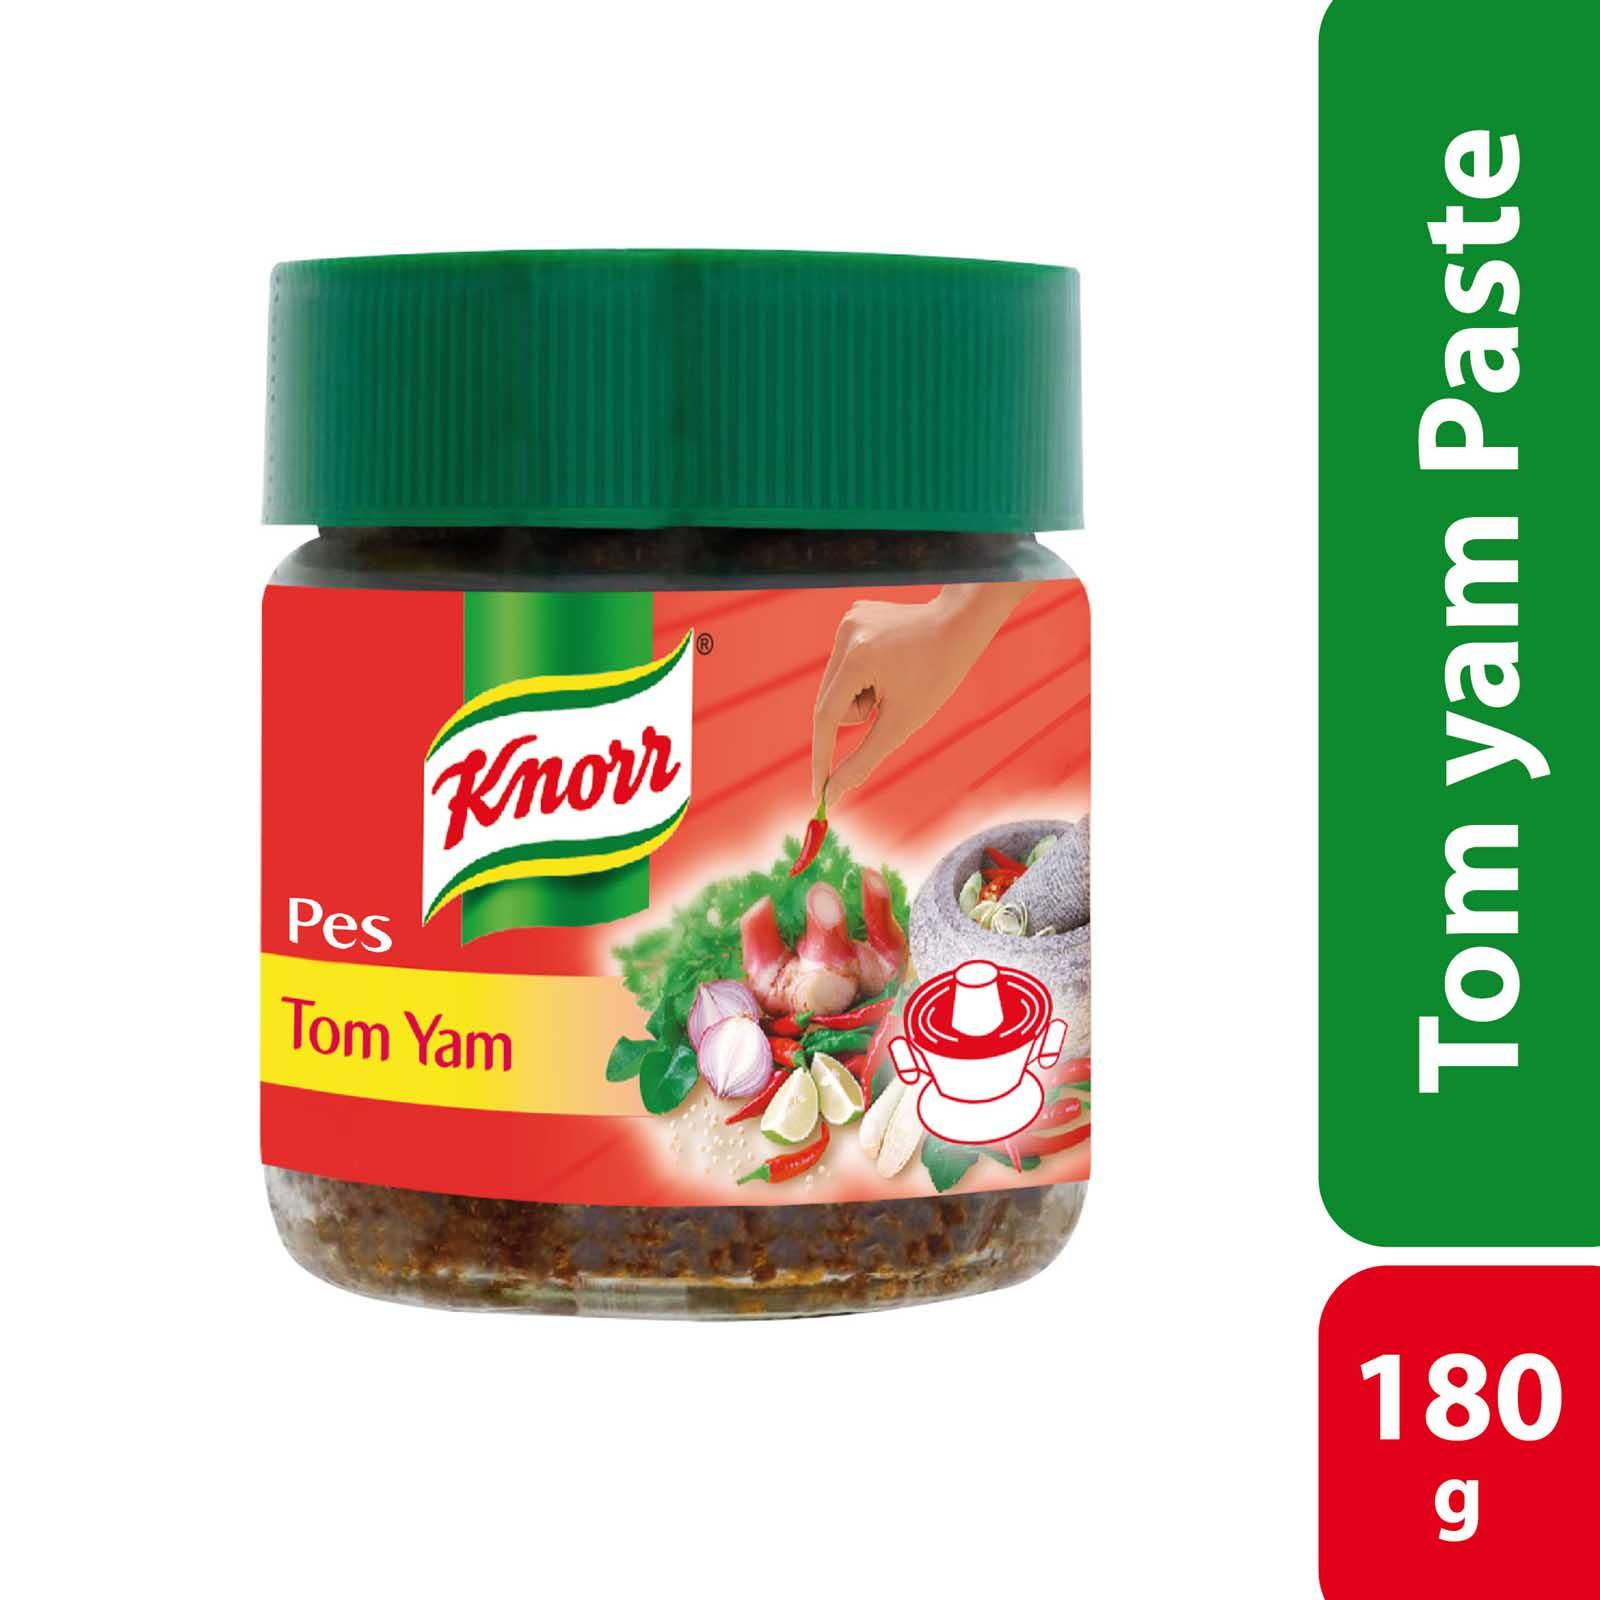 Knorr Tom Yam Paste 180g